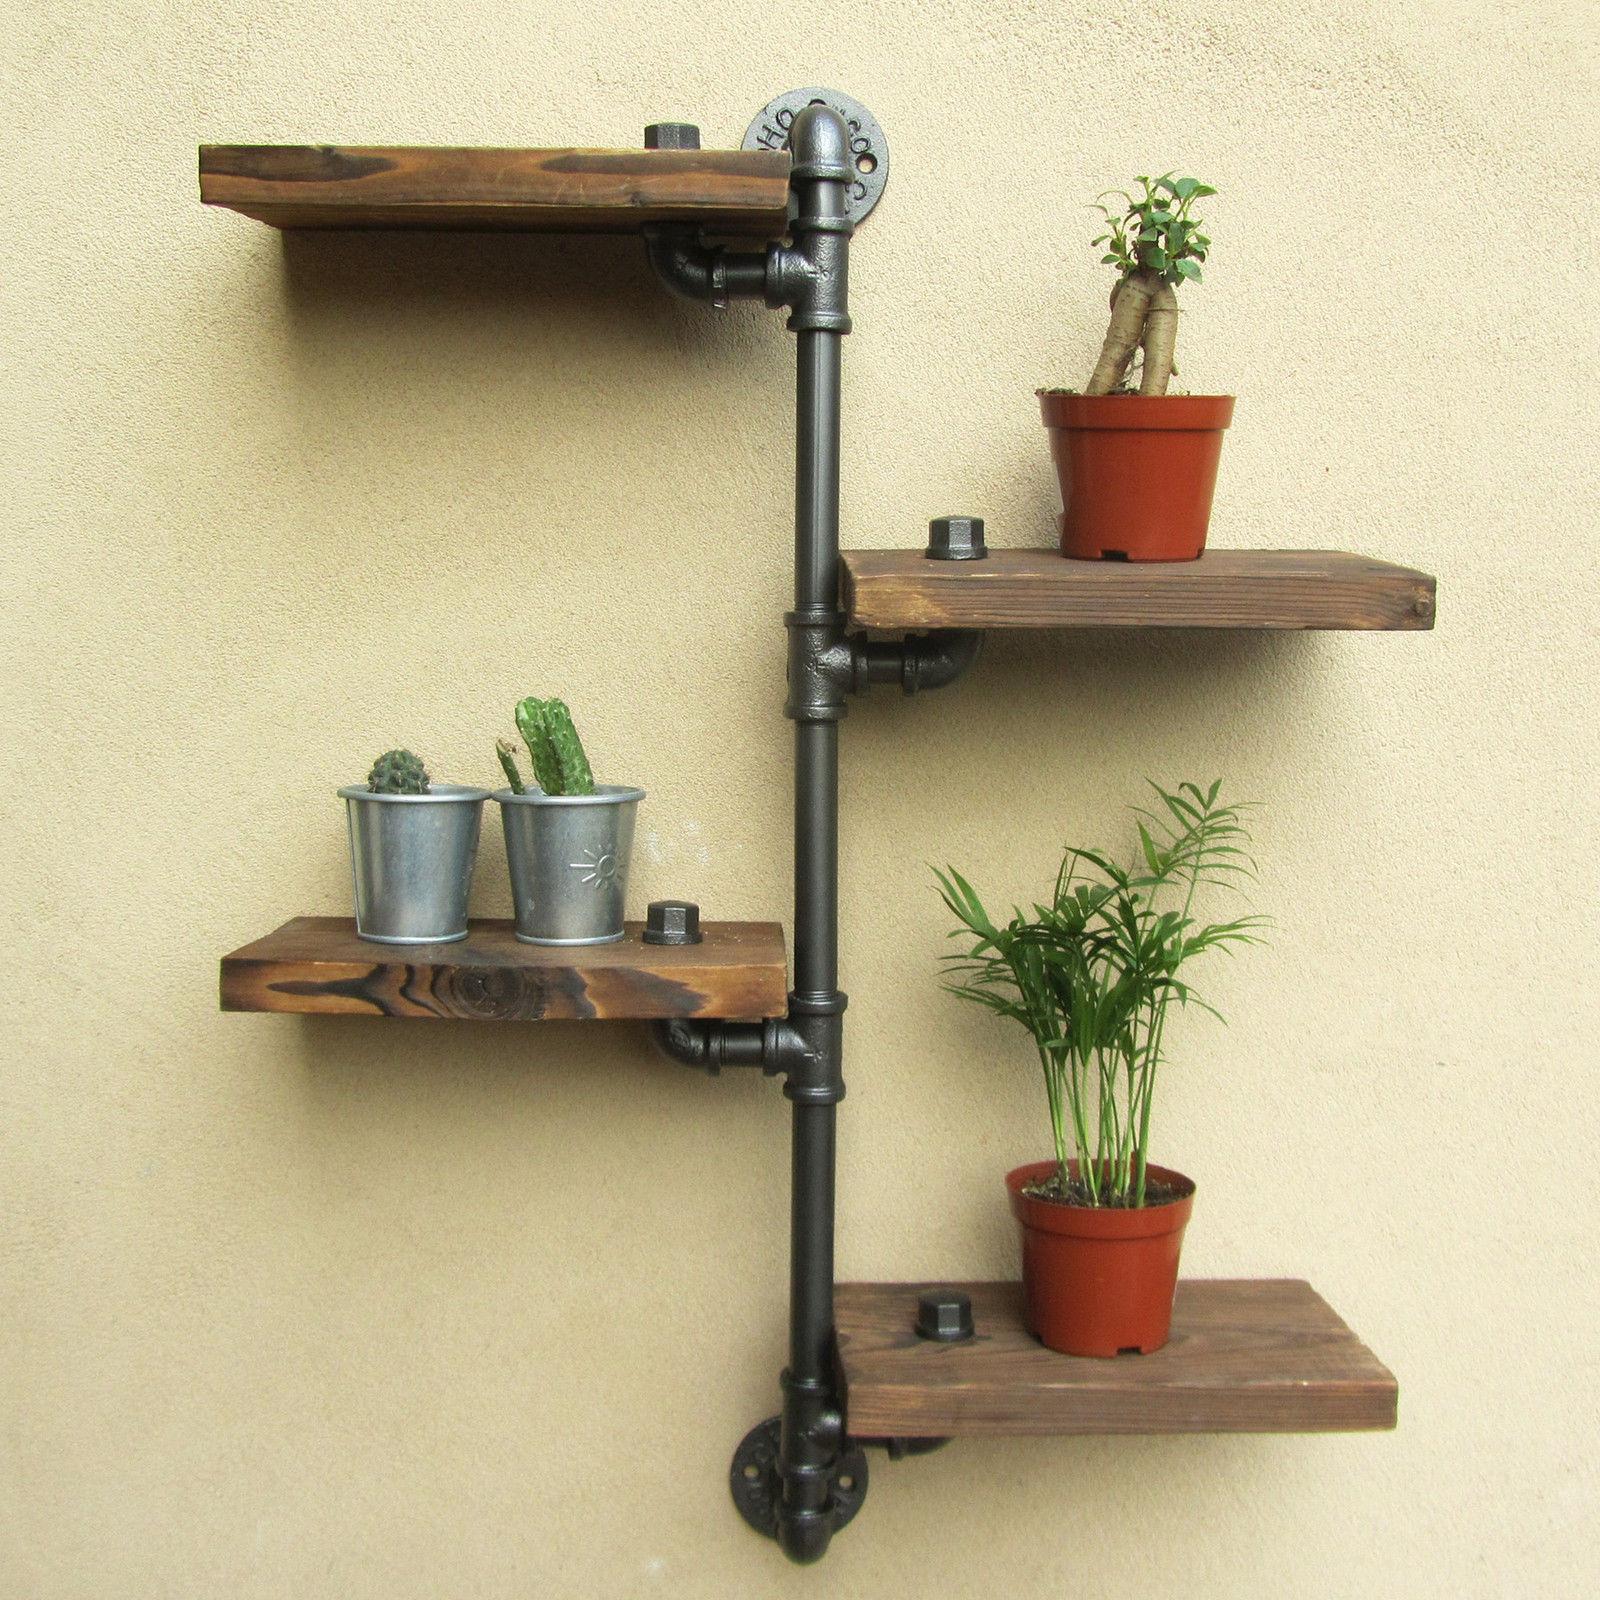 chinese kitchen accessories countertop decor steampunk wandregal aus rohren  loft regal rustikalen